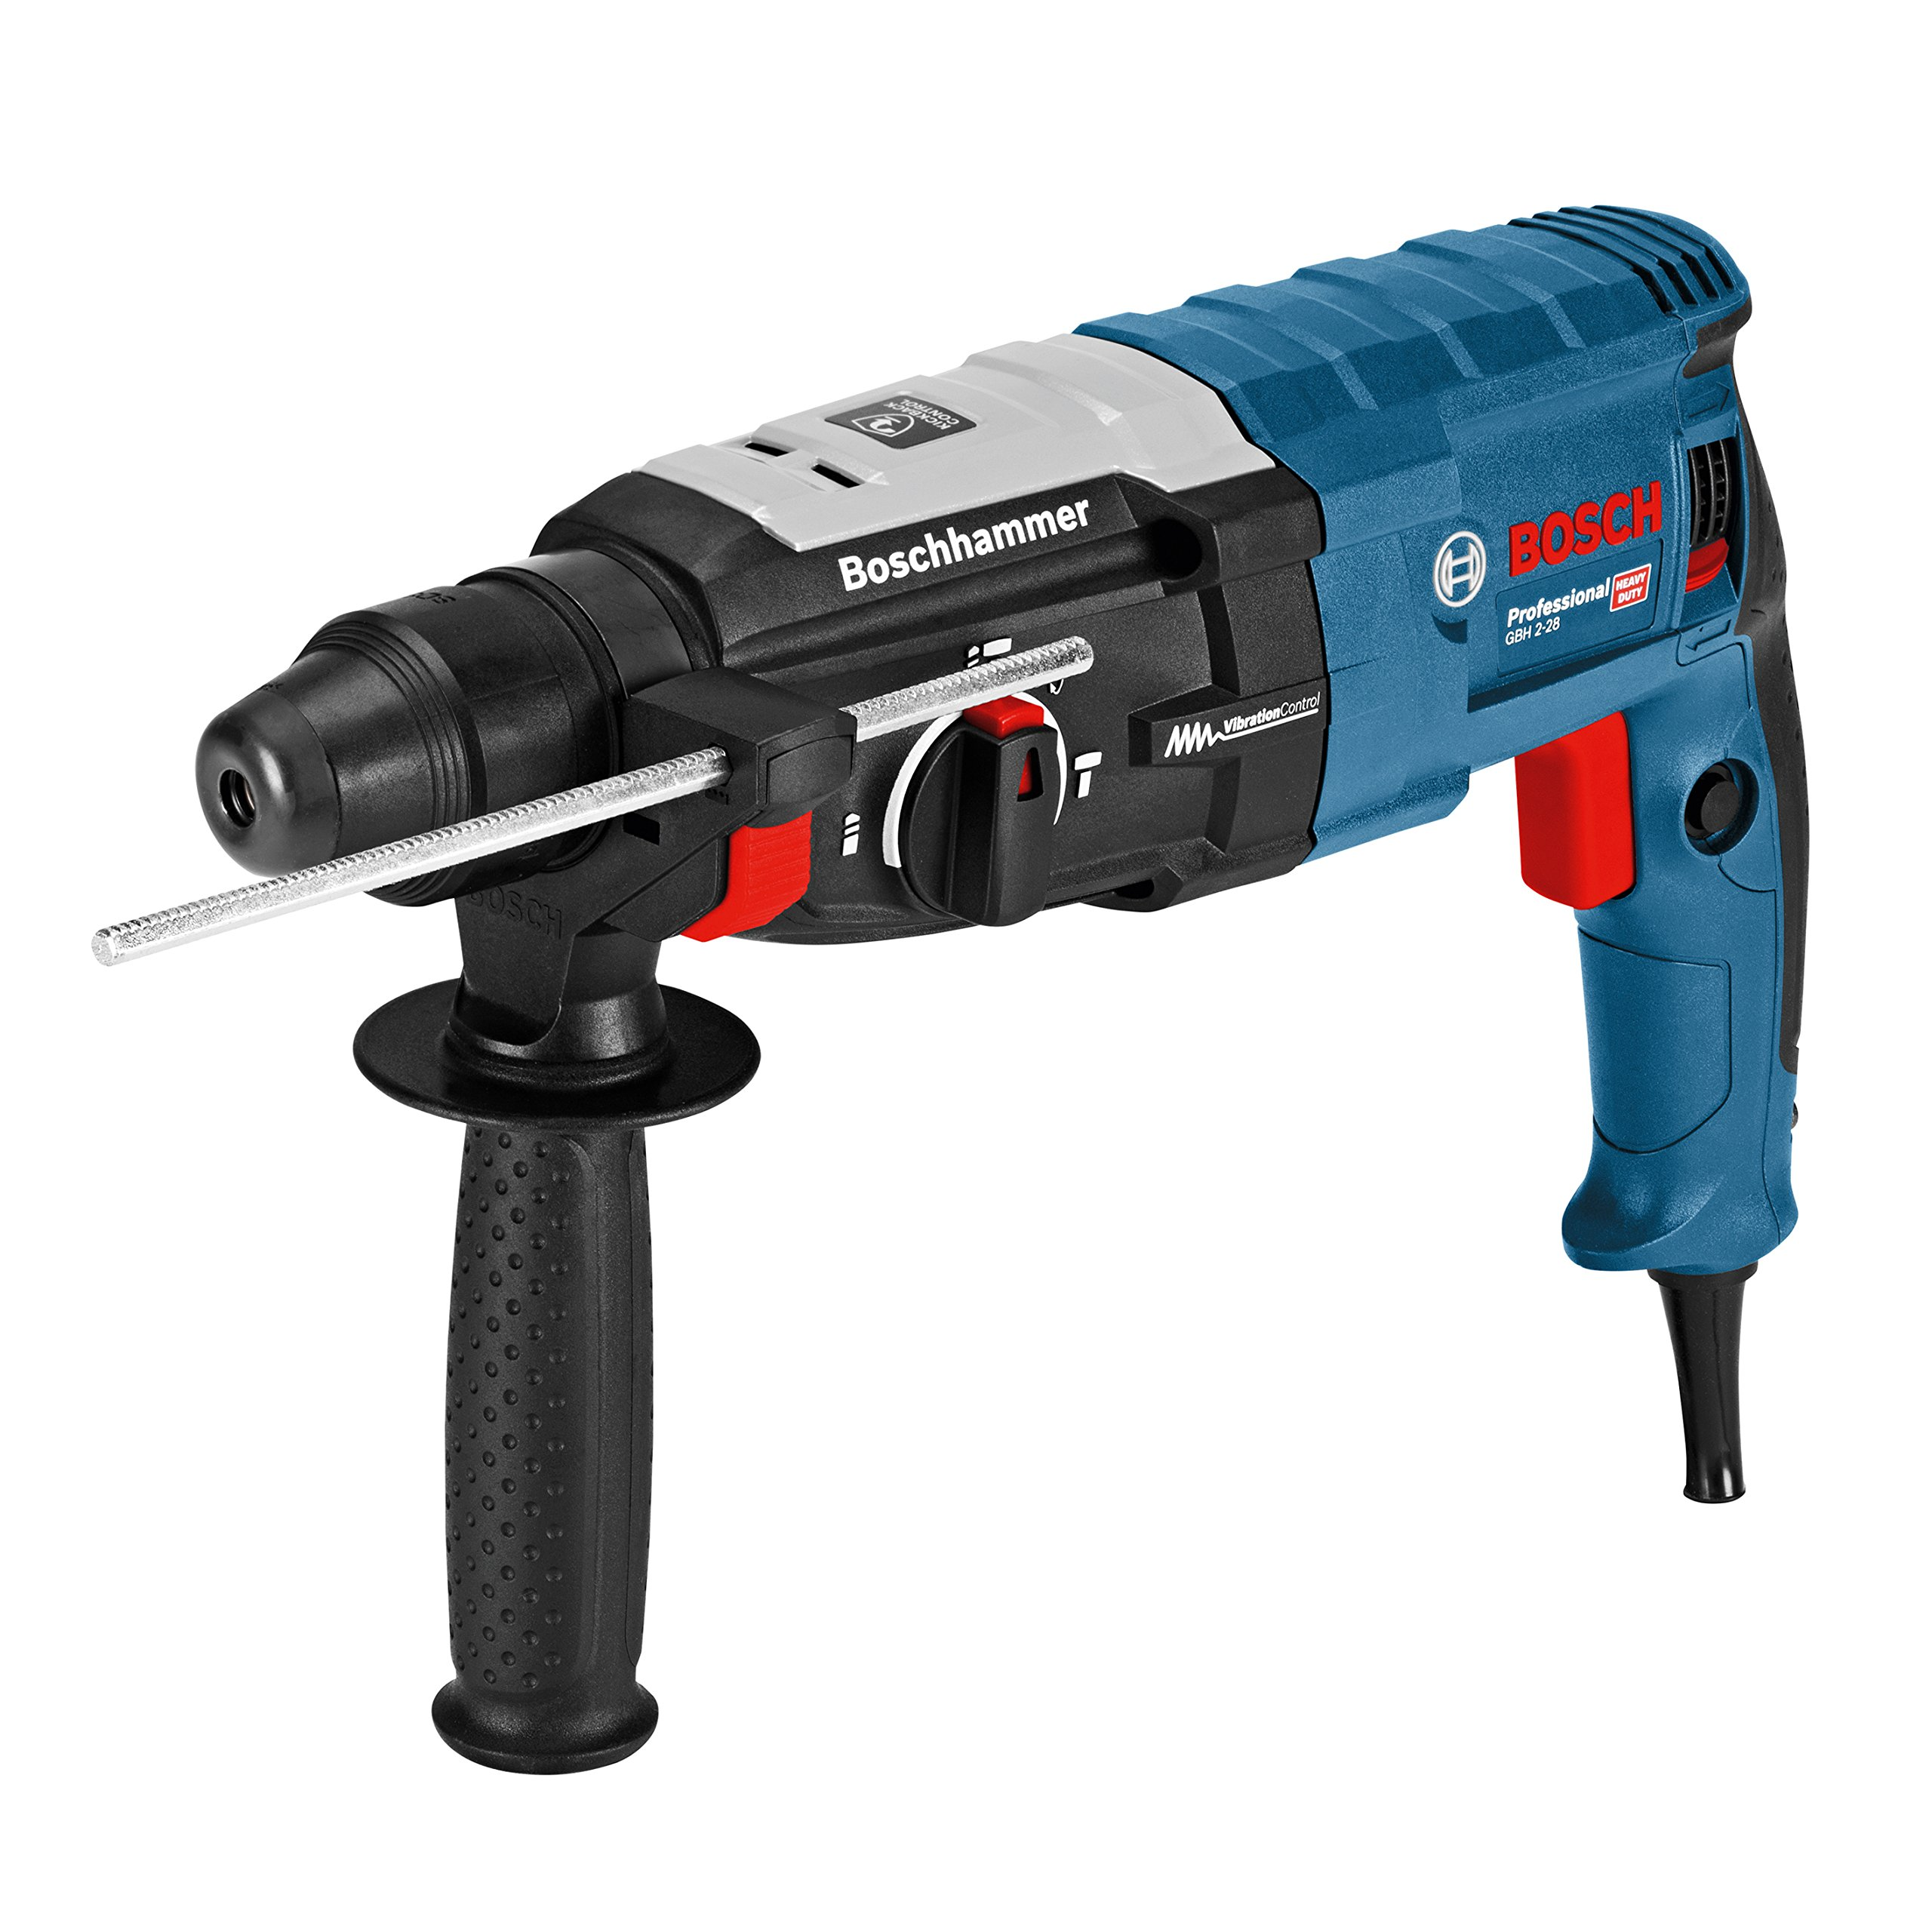 Bosch Professional 0611267500 Martillo perforador con SDS-plus Negro, Azul product image